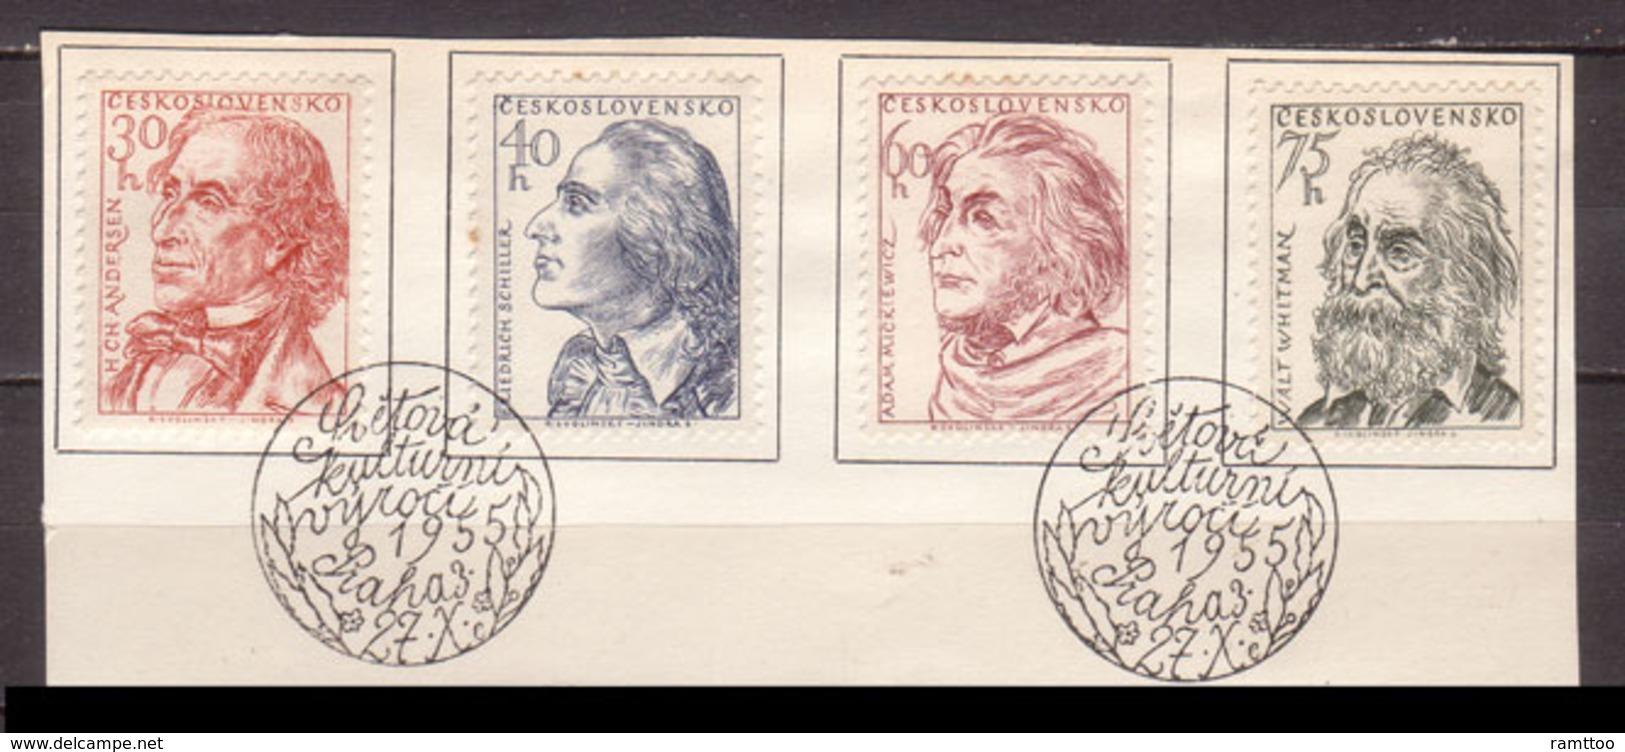 Tschechoslowakei / CSSR , 1955 , Mi.Nr. 941 - 944 O / Used  Auf Papier Ersttagsstempel - Czechoslovakia